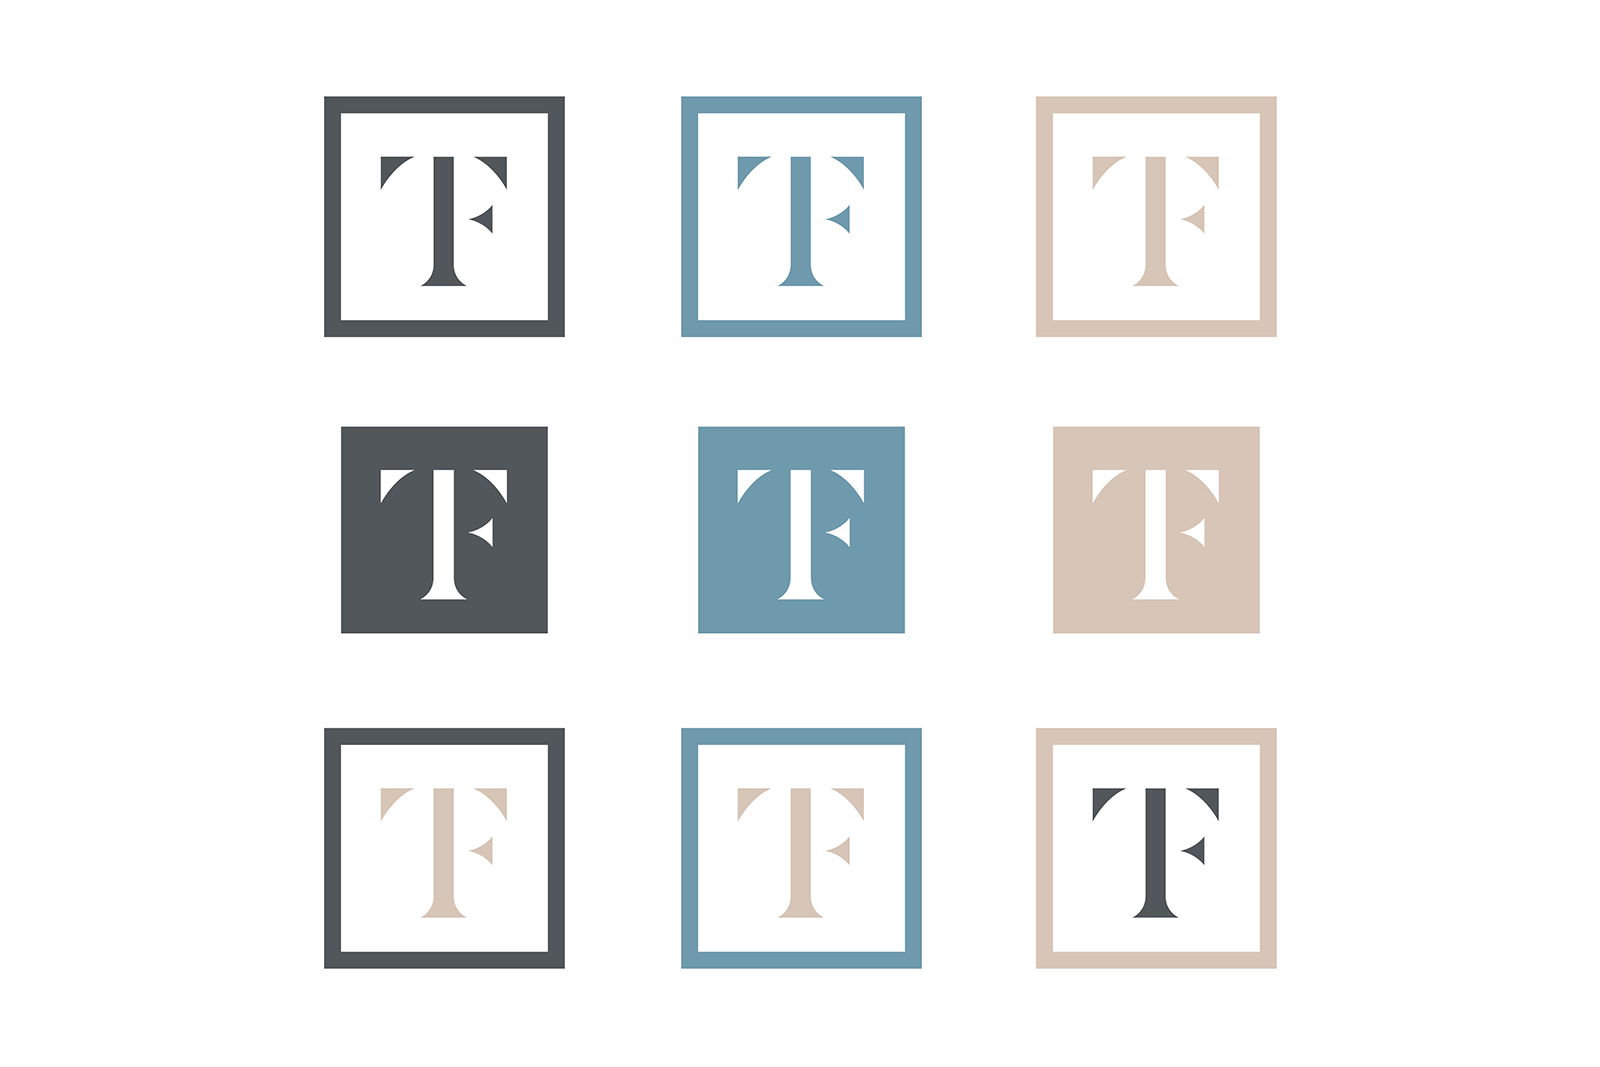 TF_Identity_Branding_V1_A6_w.jpg